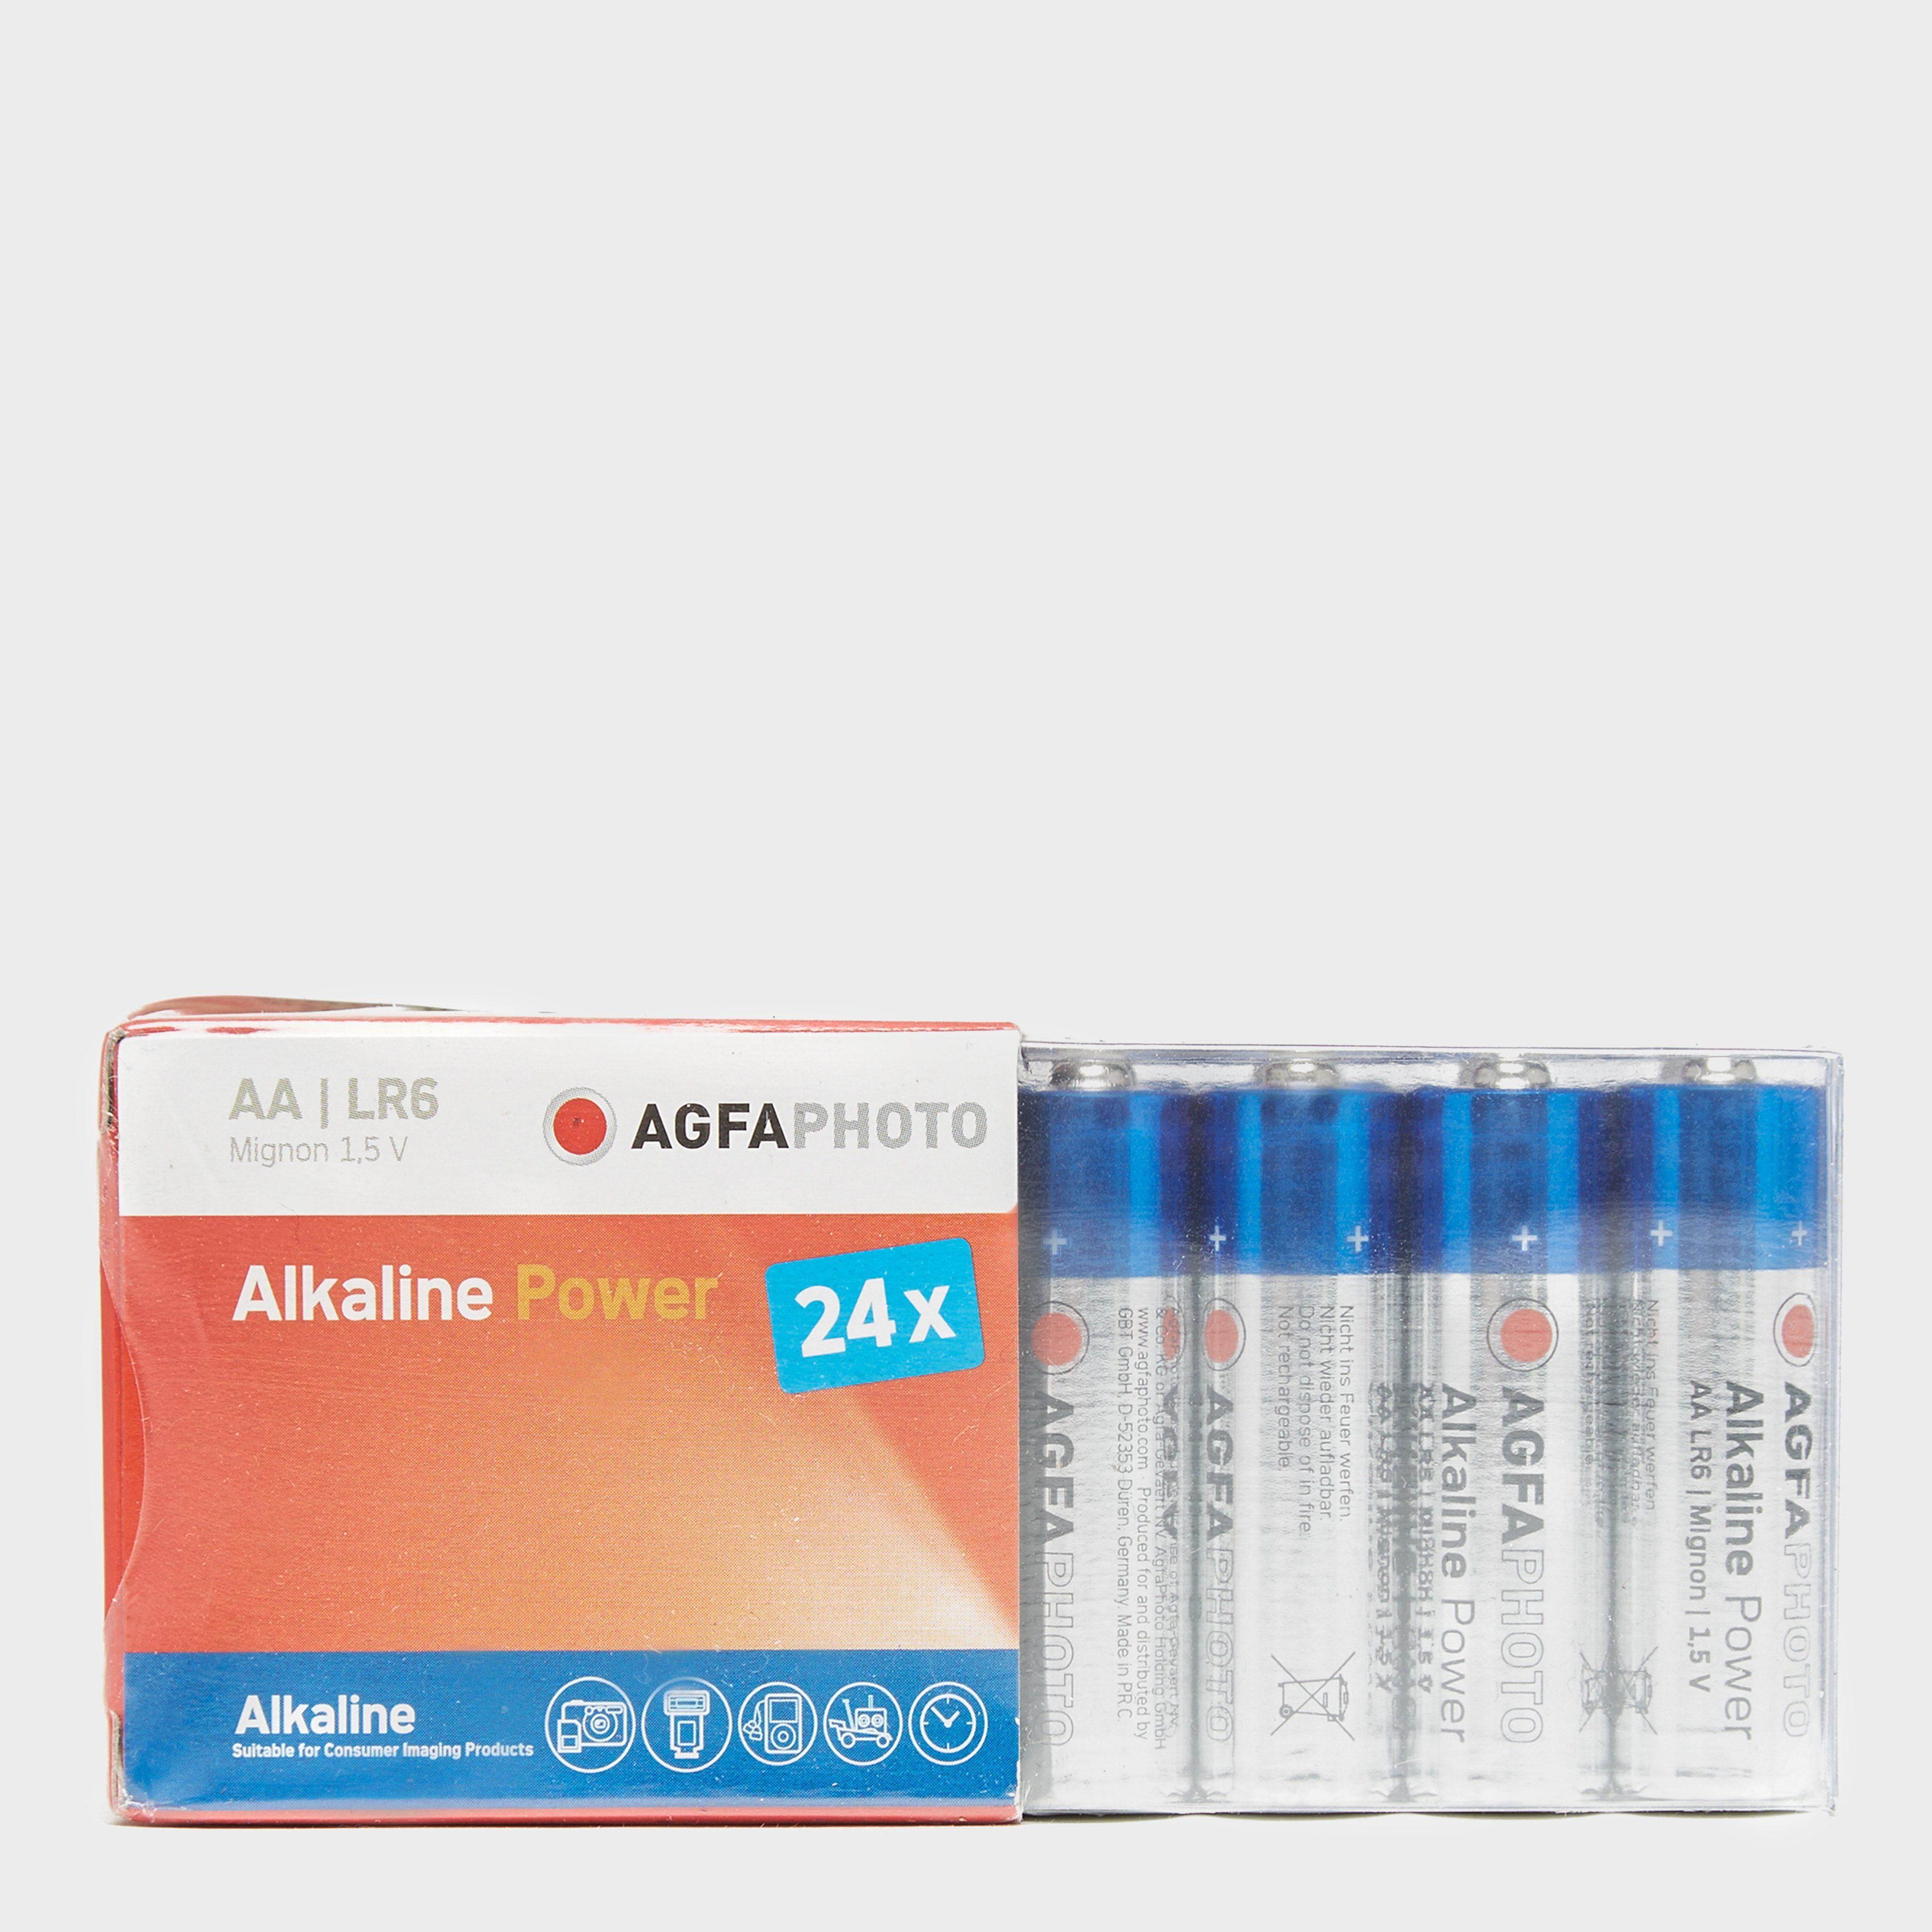 AGFA Alkaline Power AA Batteries 24 Pack